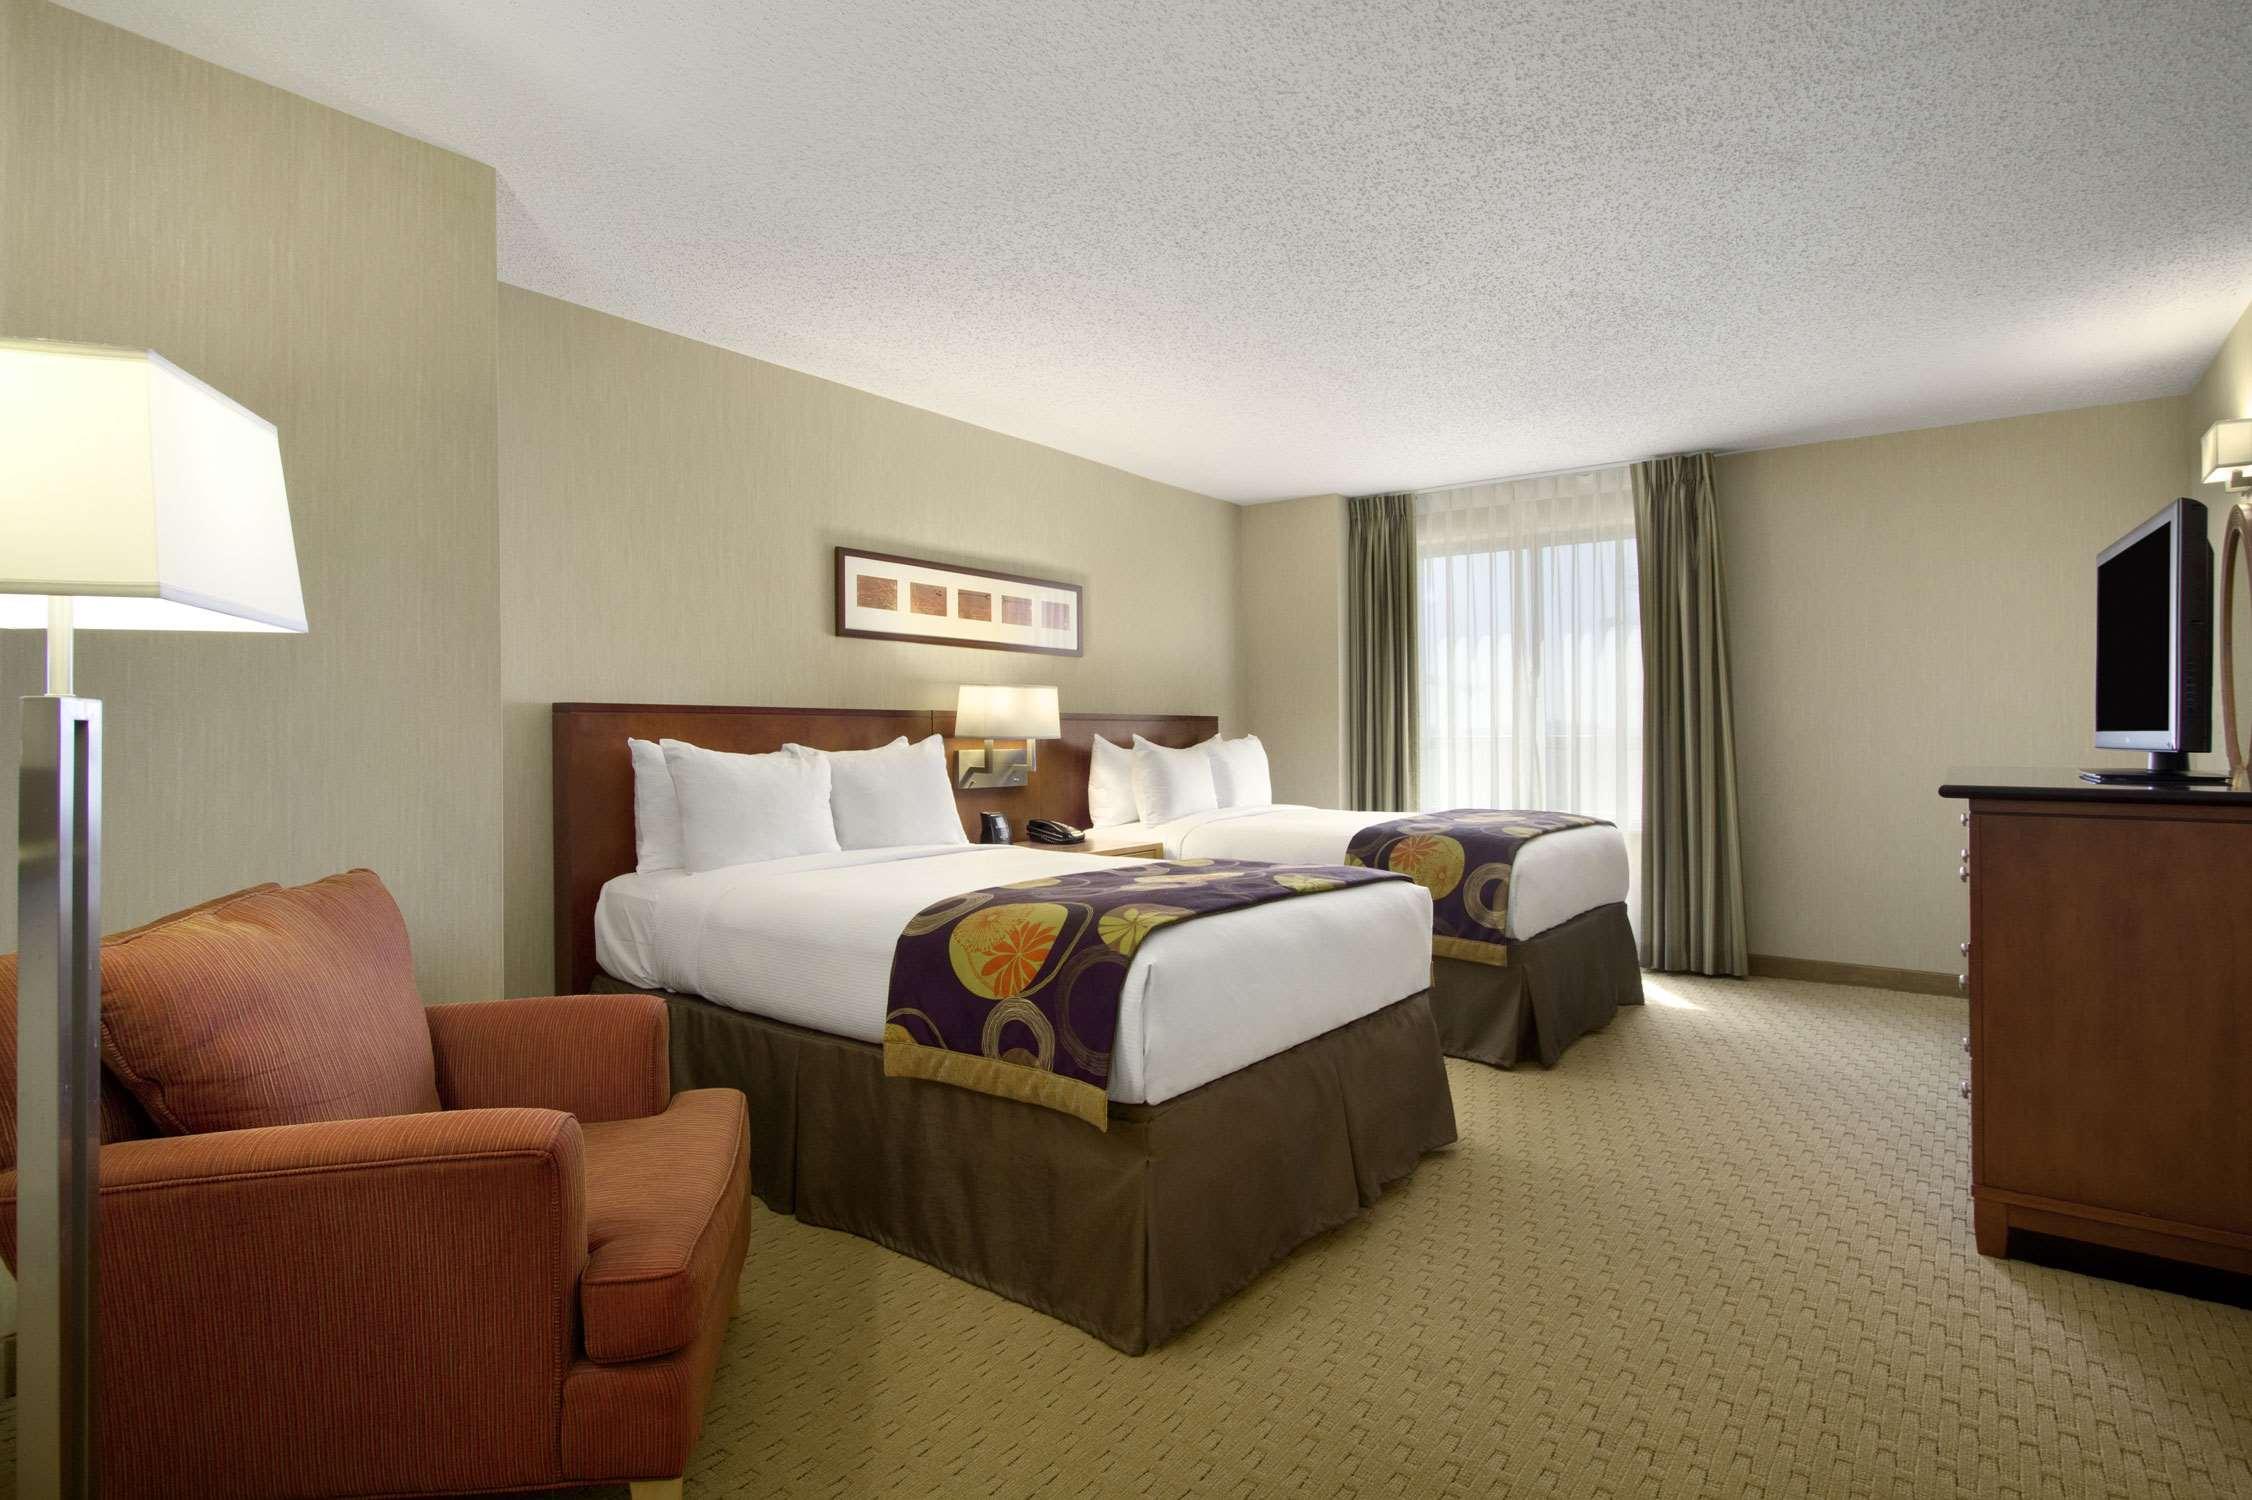 Embassy Suites by Hilton Washington DC Convention Center image 22